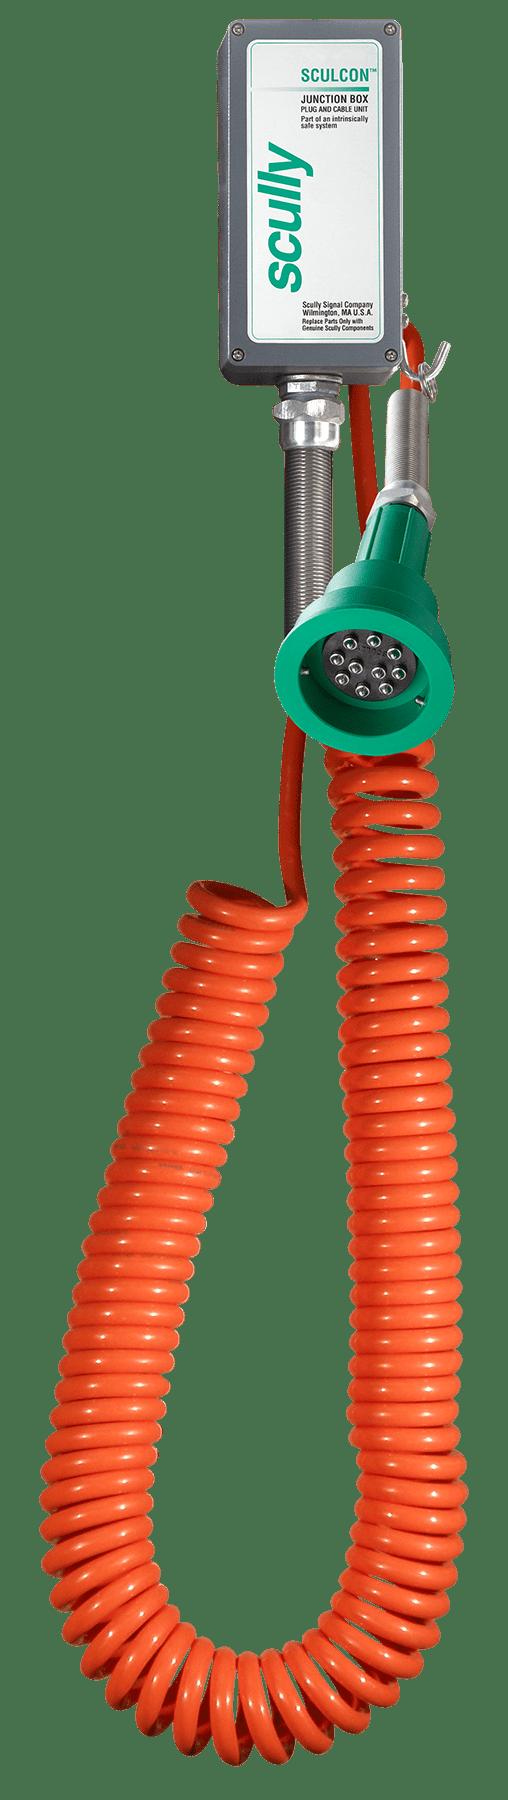 hight resolution of sculcon plug 01